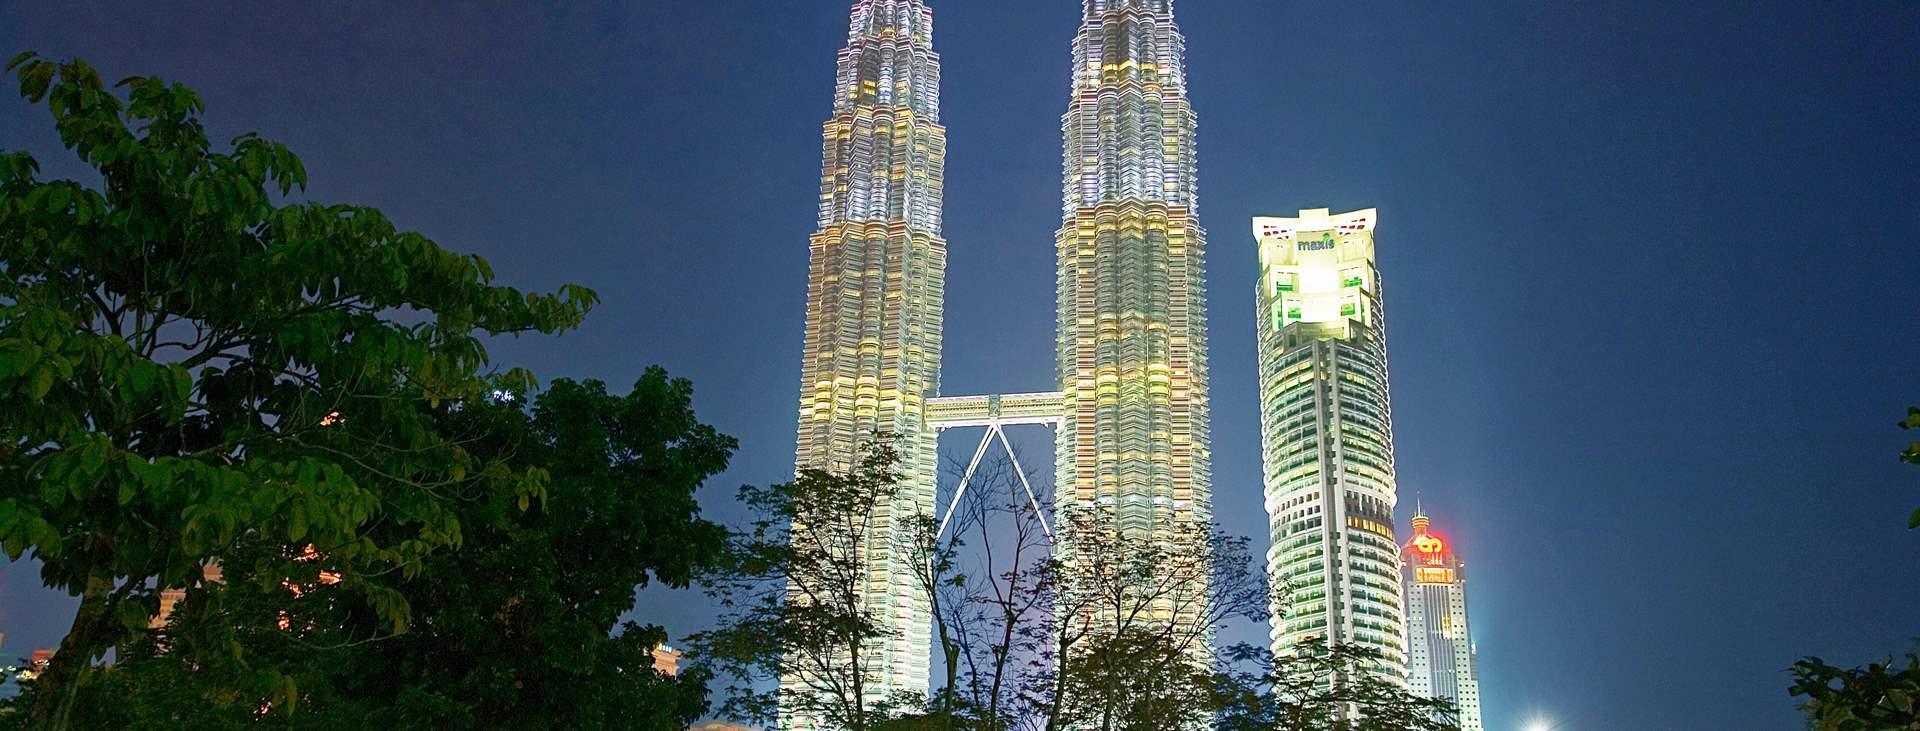 Boka din resa till Kuala Lumpur i Malaysia med Ving